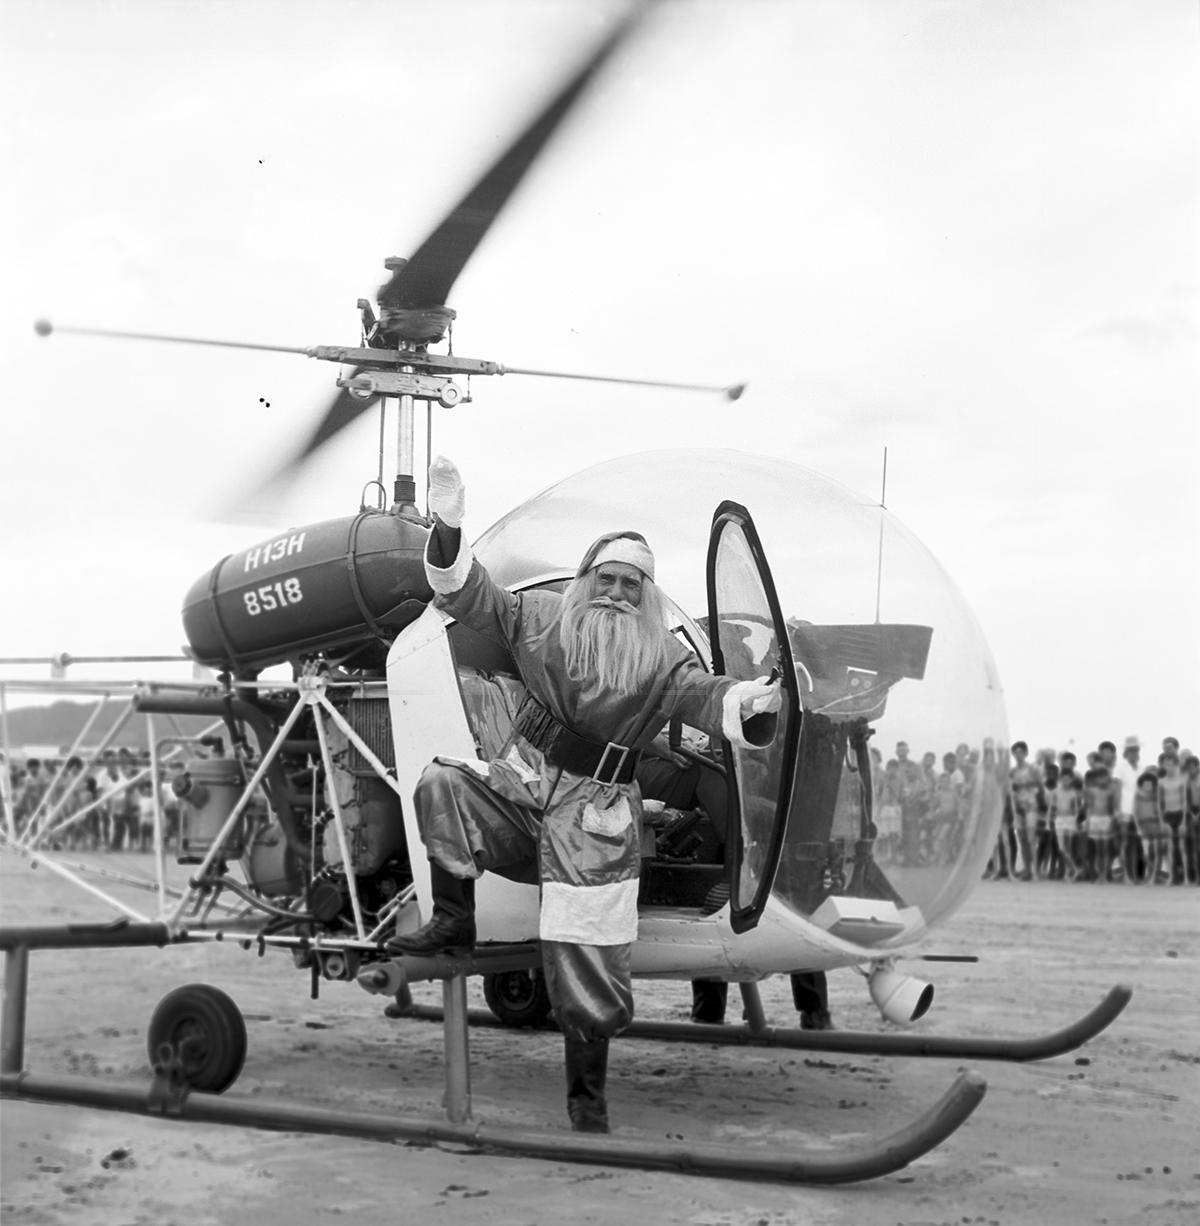 Papai Noel de 1961, inovando na chegada de helicóptero.